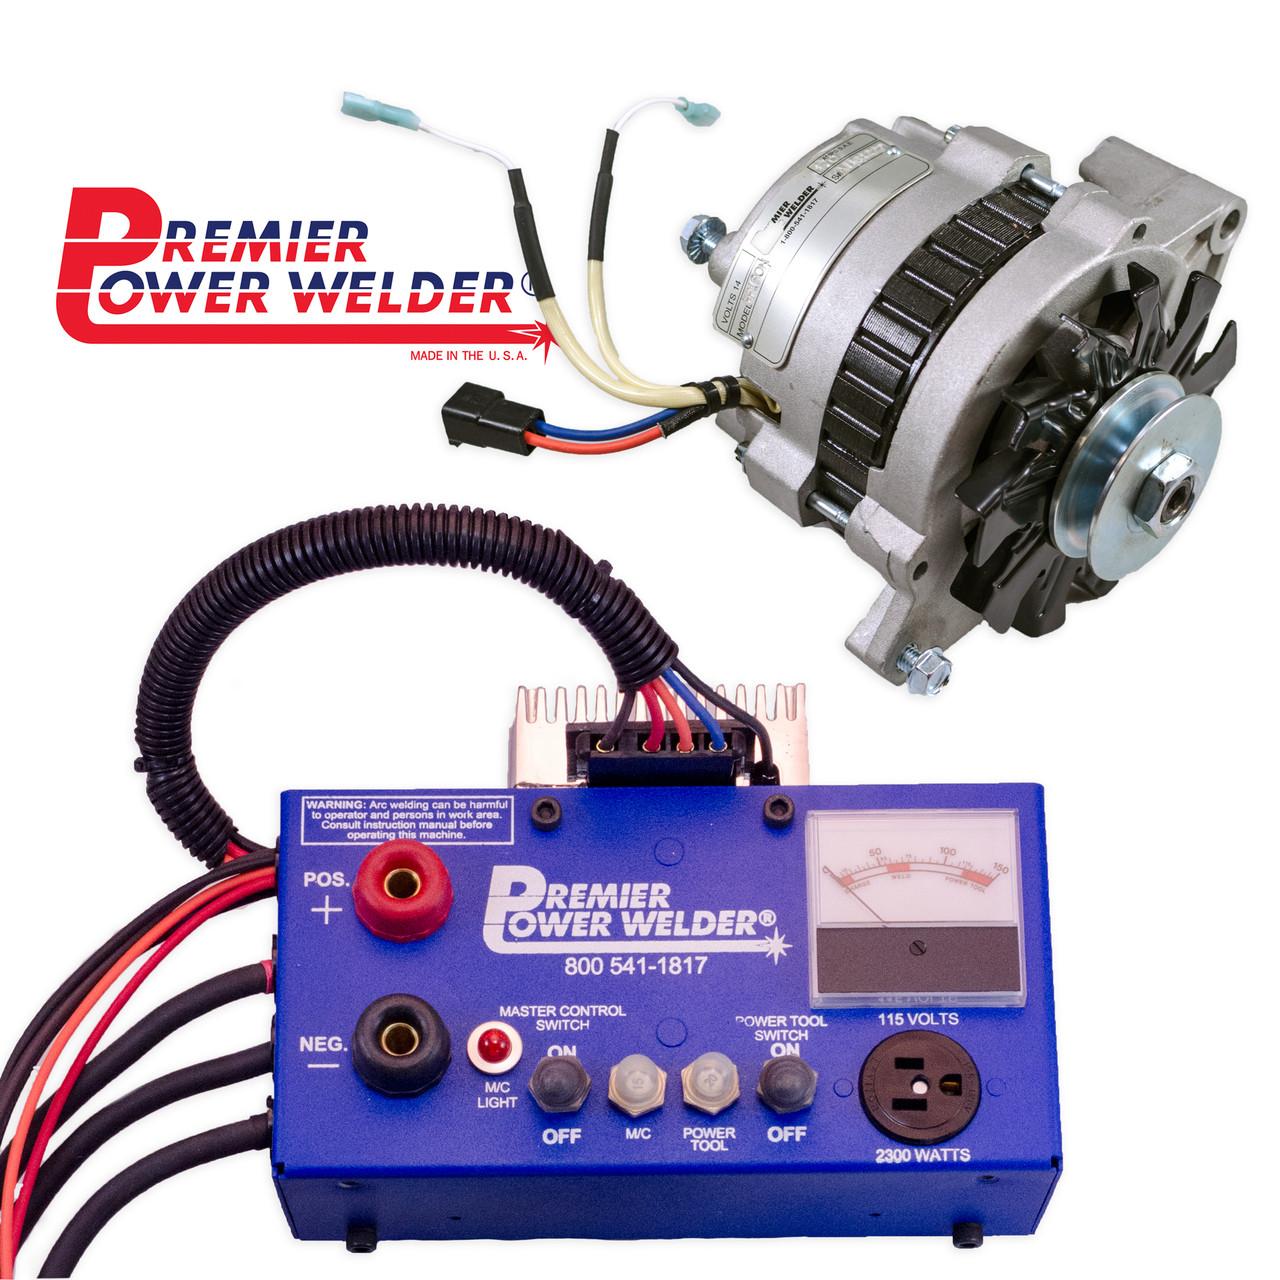 1987 jeep wrangler electrical wiring jeep wrangler 1987 1990 4 2l  170 amps  single v pulley premier  jeep wrangler 1987 1990 4 2l  170 amps